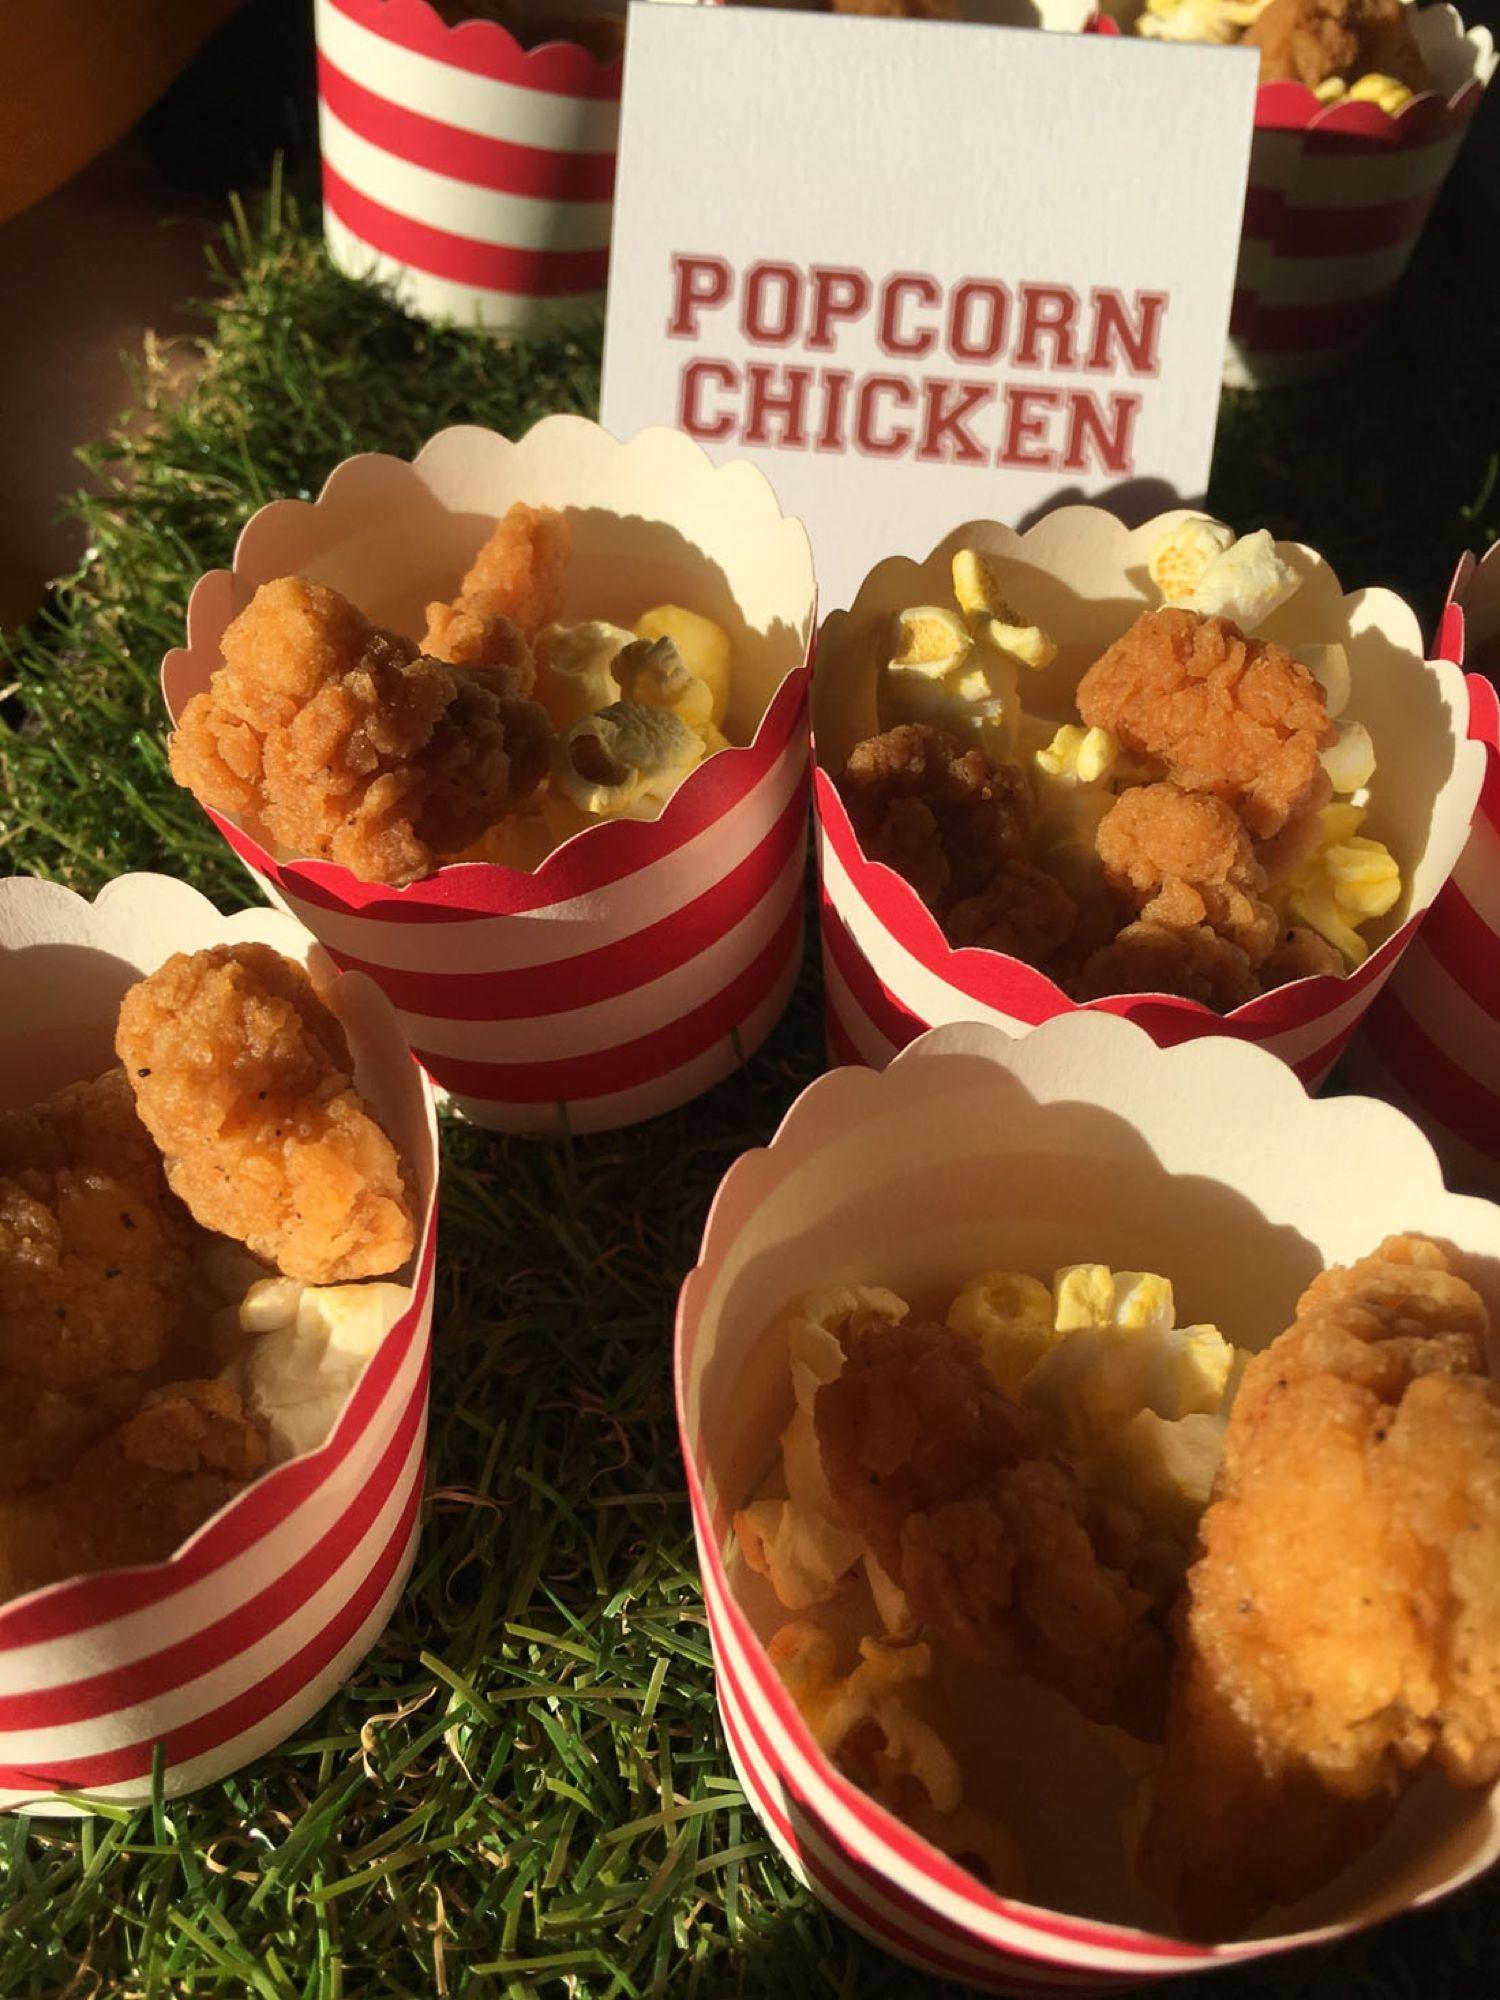 Mitzvah Catering Sports Theme Popcorn Chicken